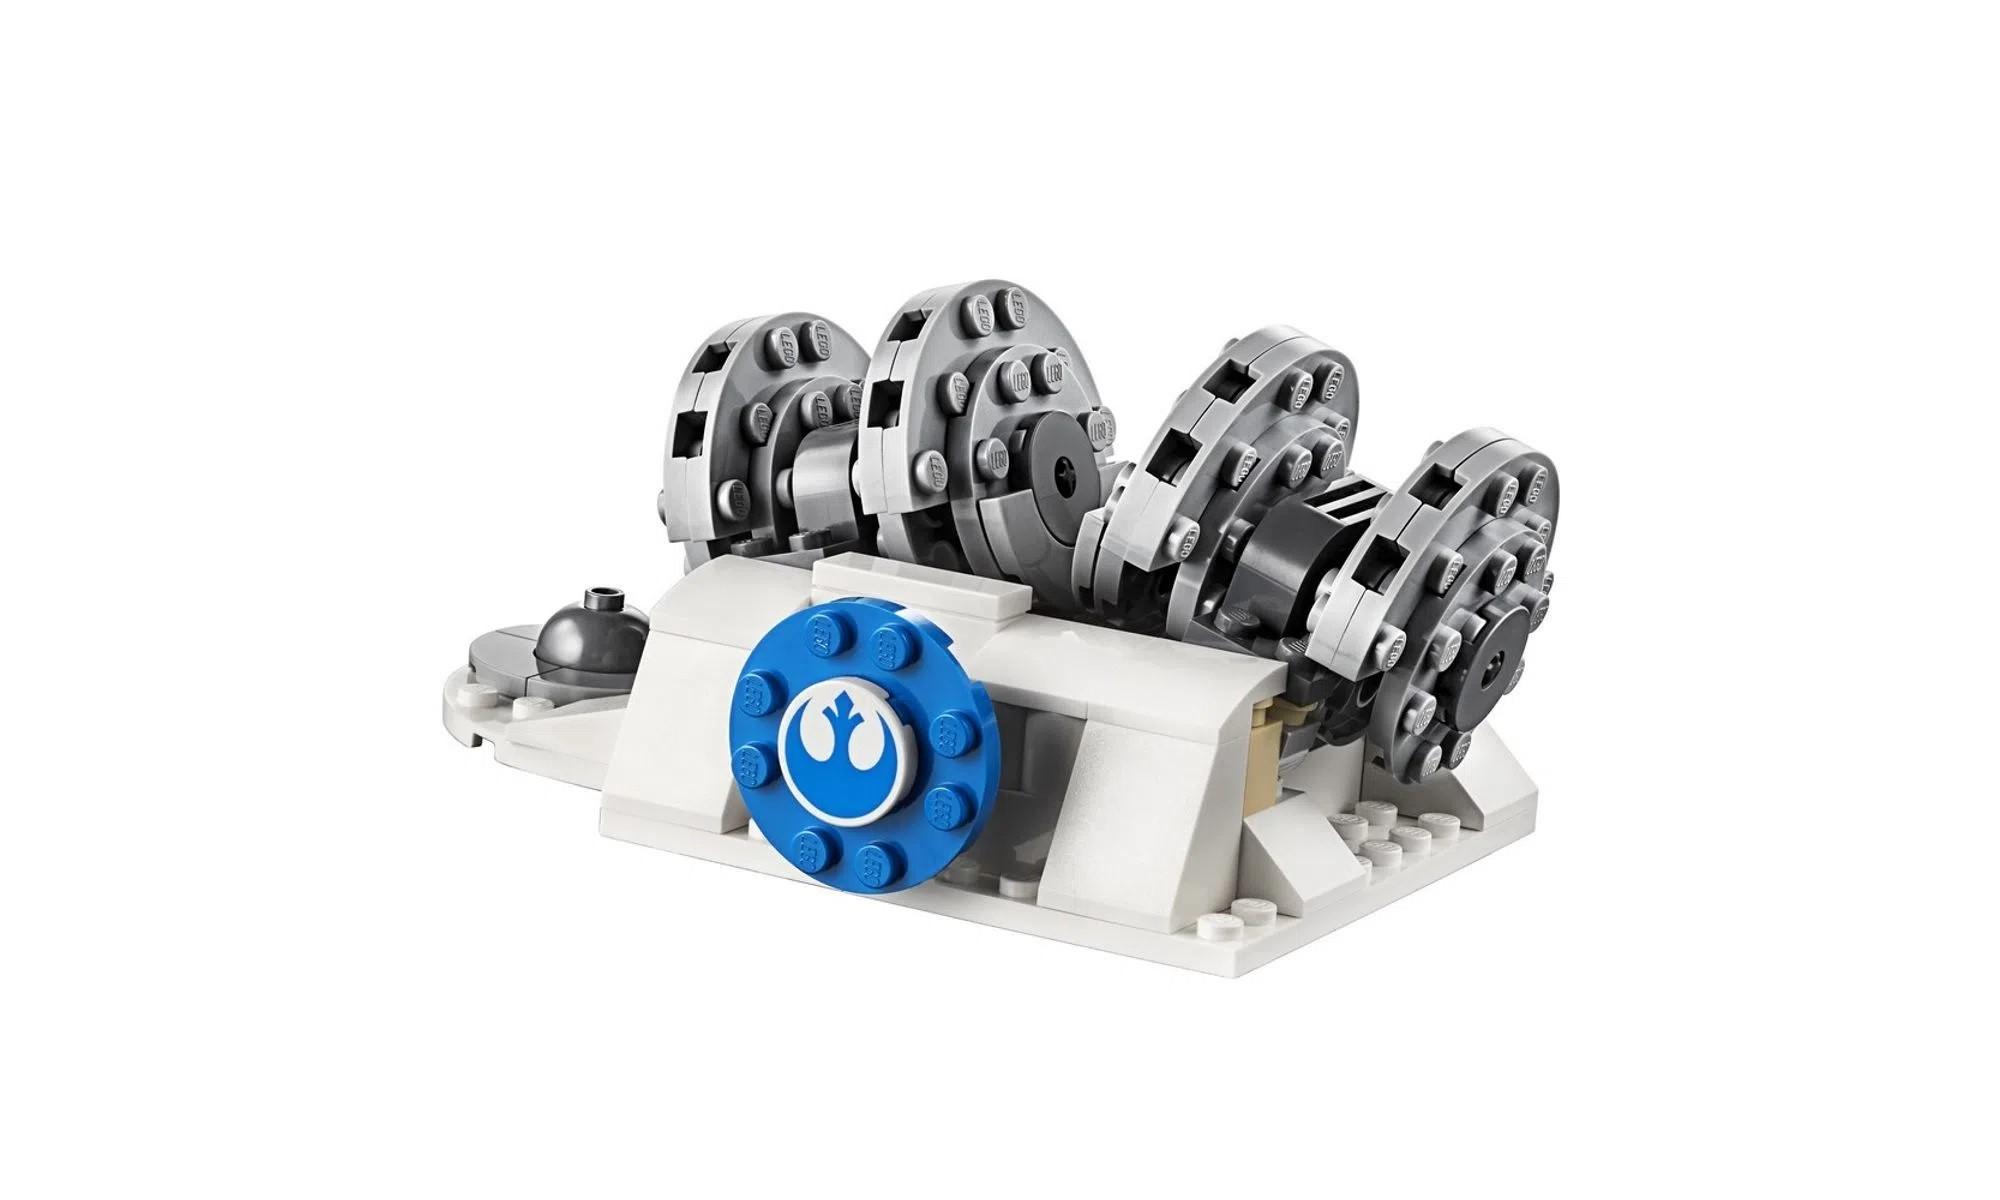 LEGO Star Wars Batalha de Hoth Ataque ao Gerador 75239